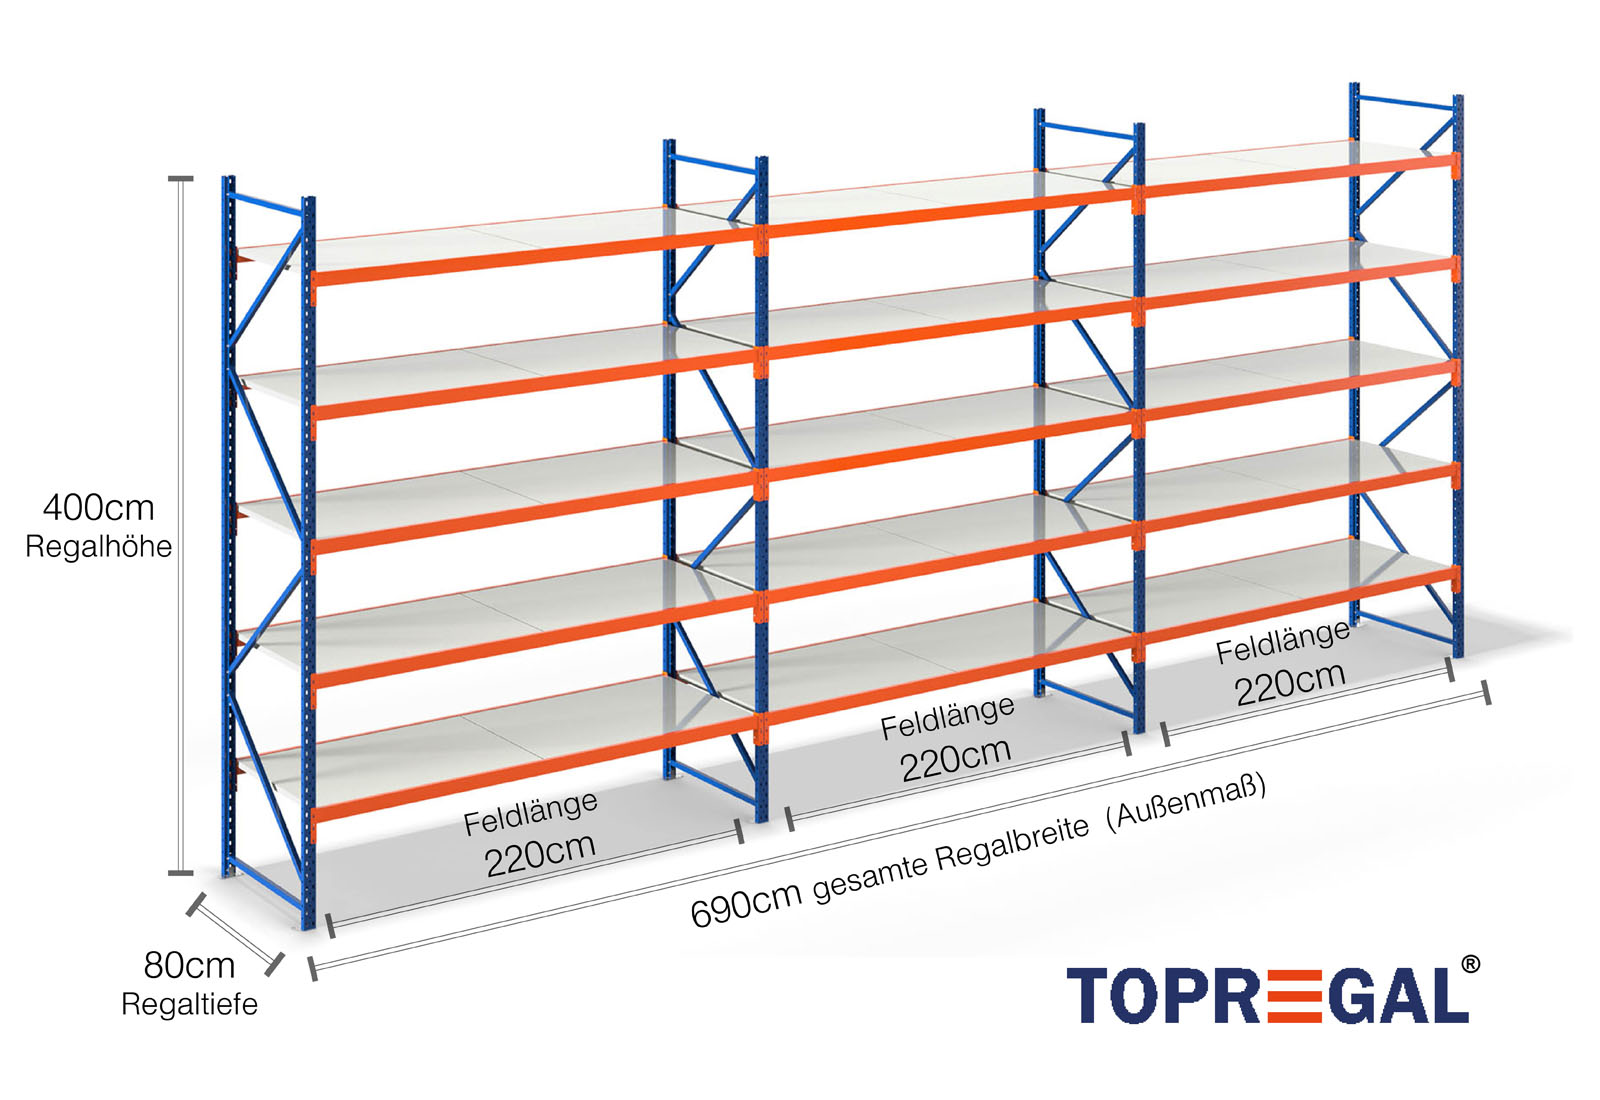 6 9m lagerregal 400cm hoch 80cm tief mit 5 ebenen inkl stahlb den. Black Bedroom Furniture Sets. Home Design Ideas